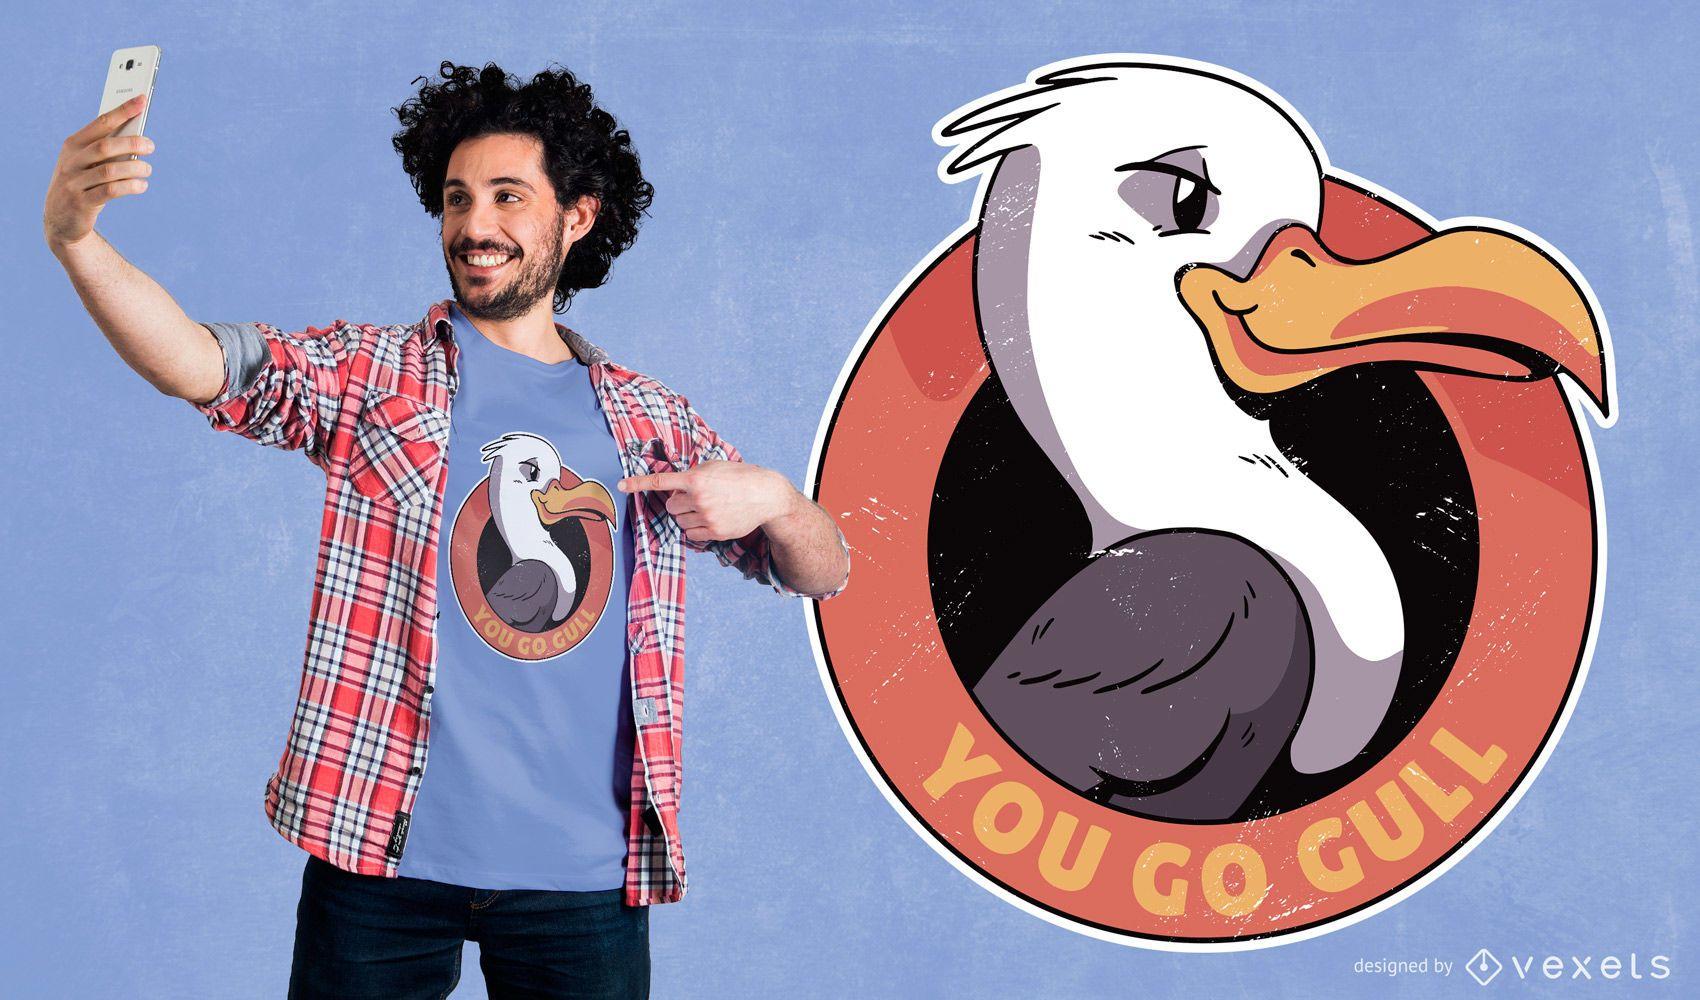 You go gull t-shirt design